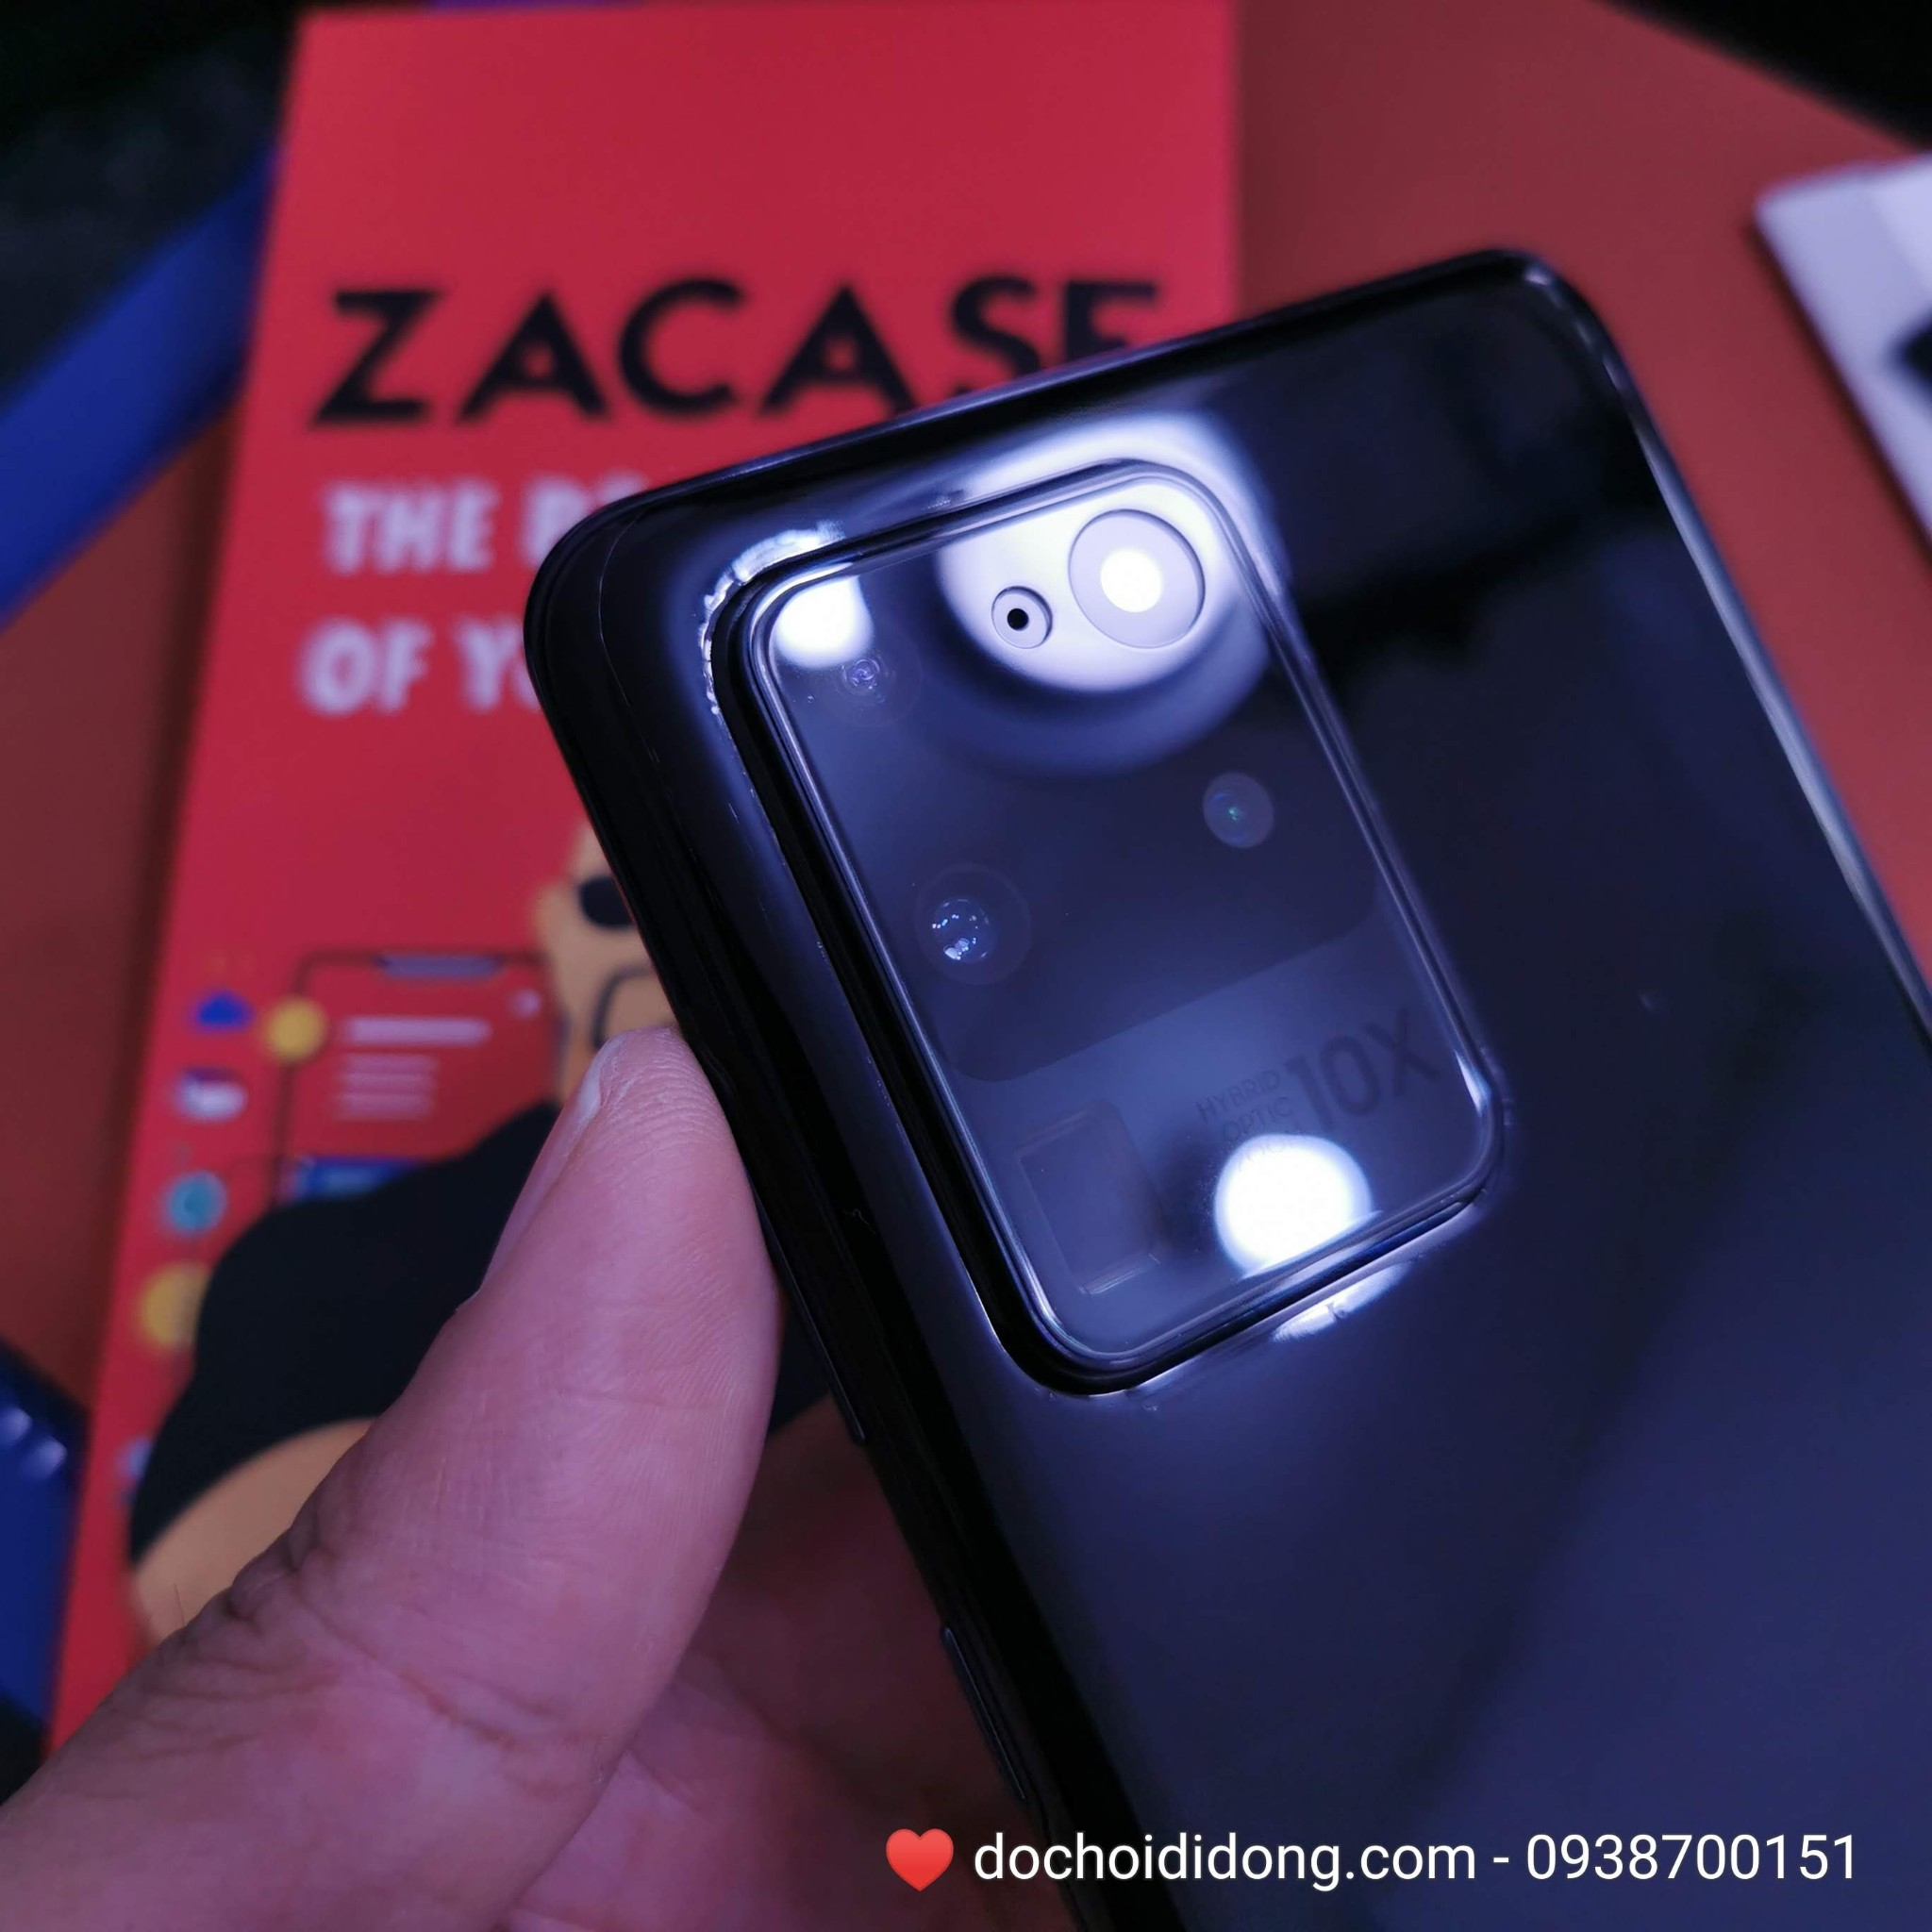 mieng-dan-cuong-luc-camera-samsung-s20-s20-plus-s20-ultra-zacase-thuy-tinh-huu-co